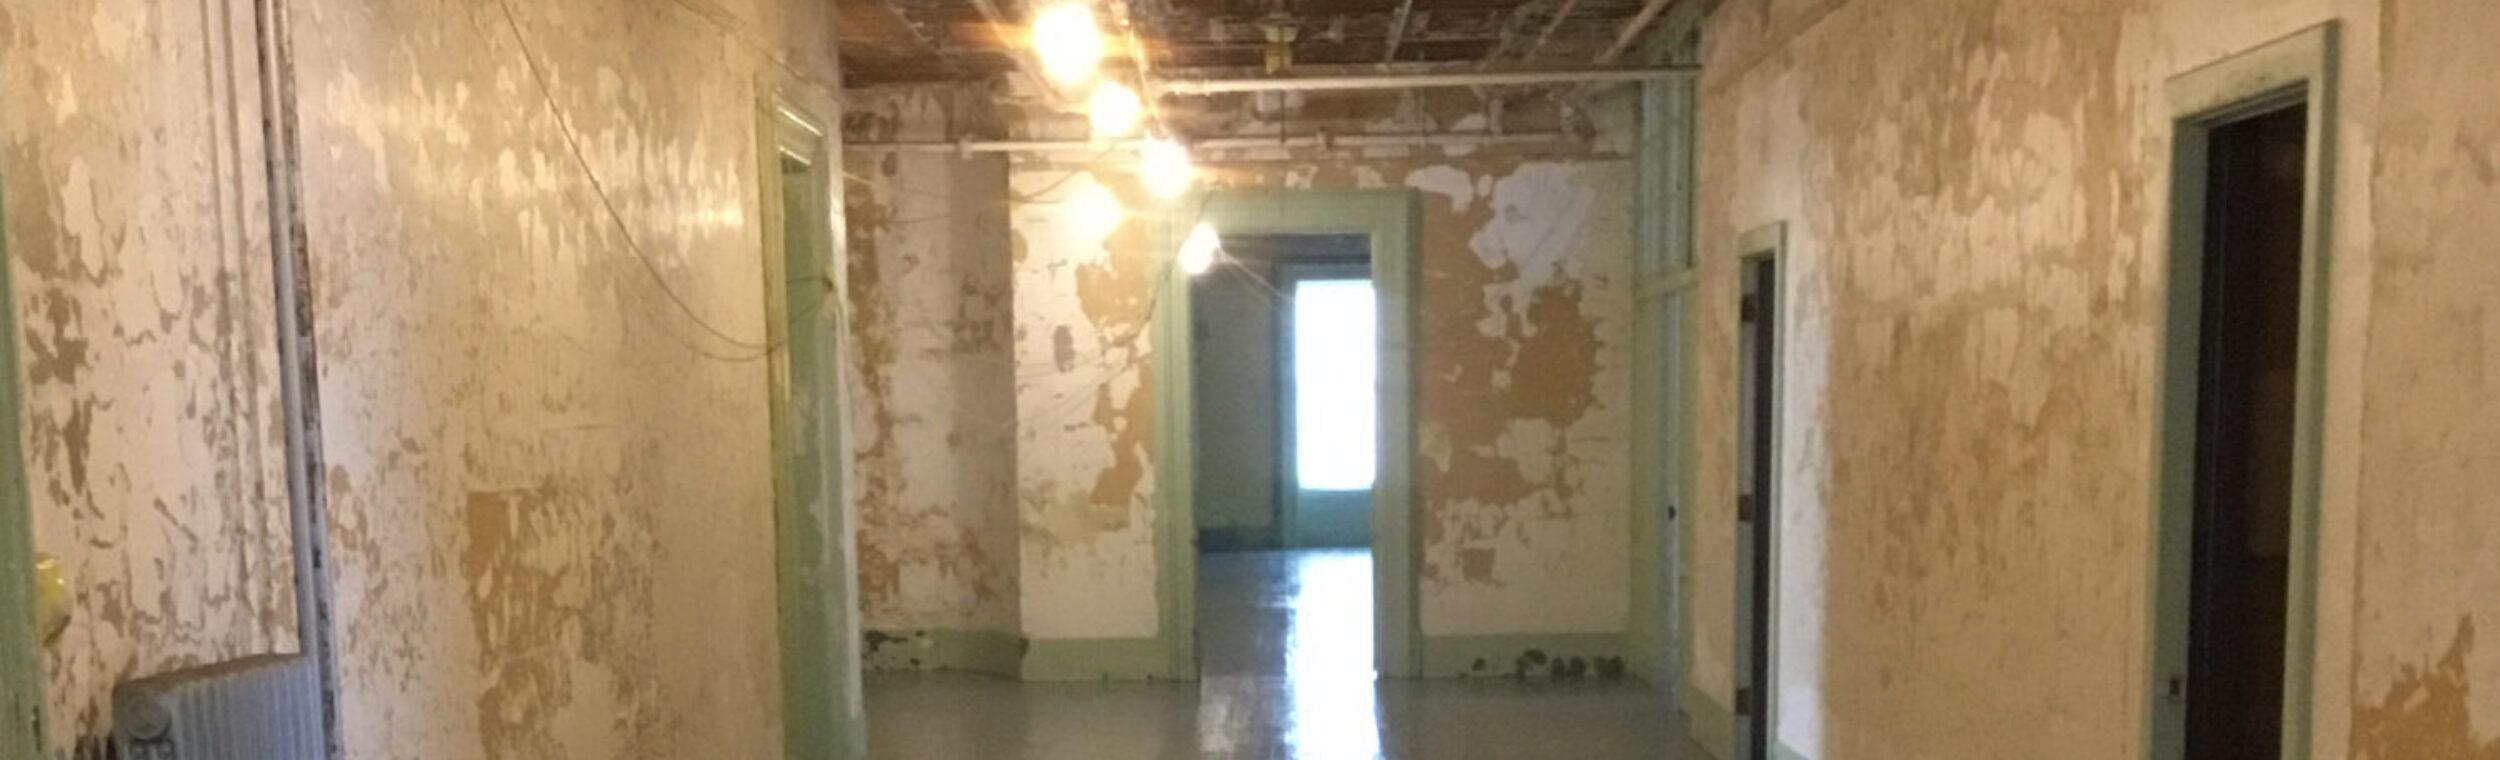 Asbestos Lead Abatement Utica, NY Sessler Environmental